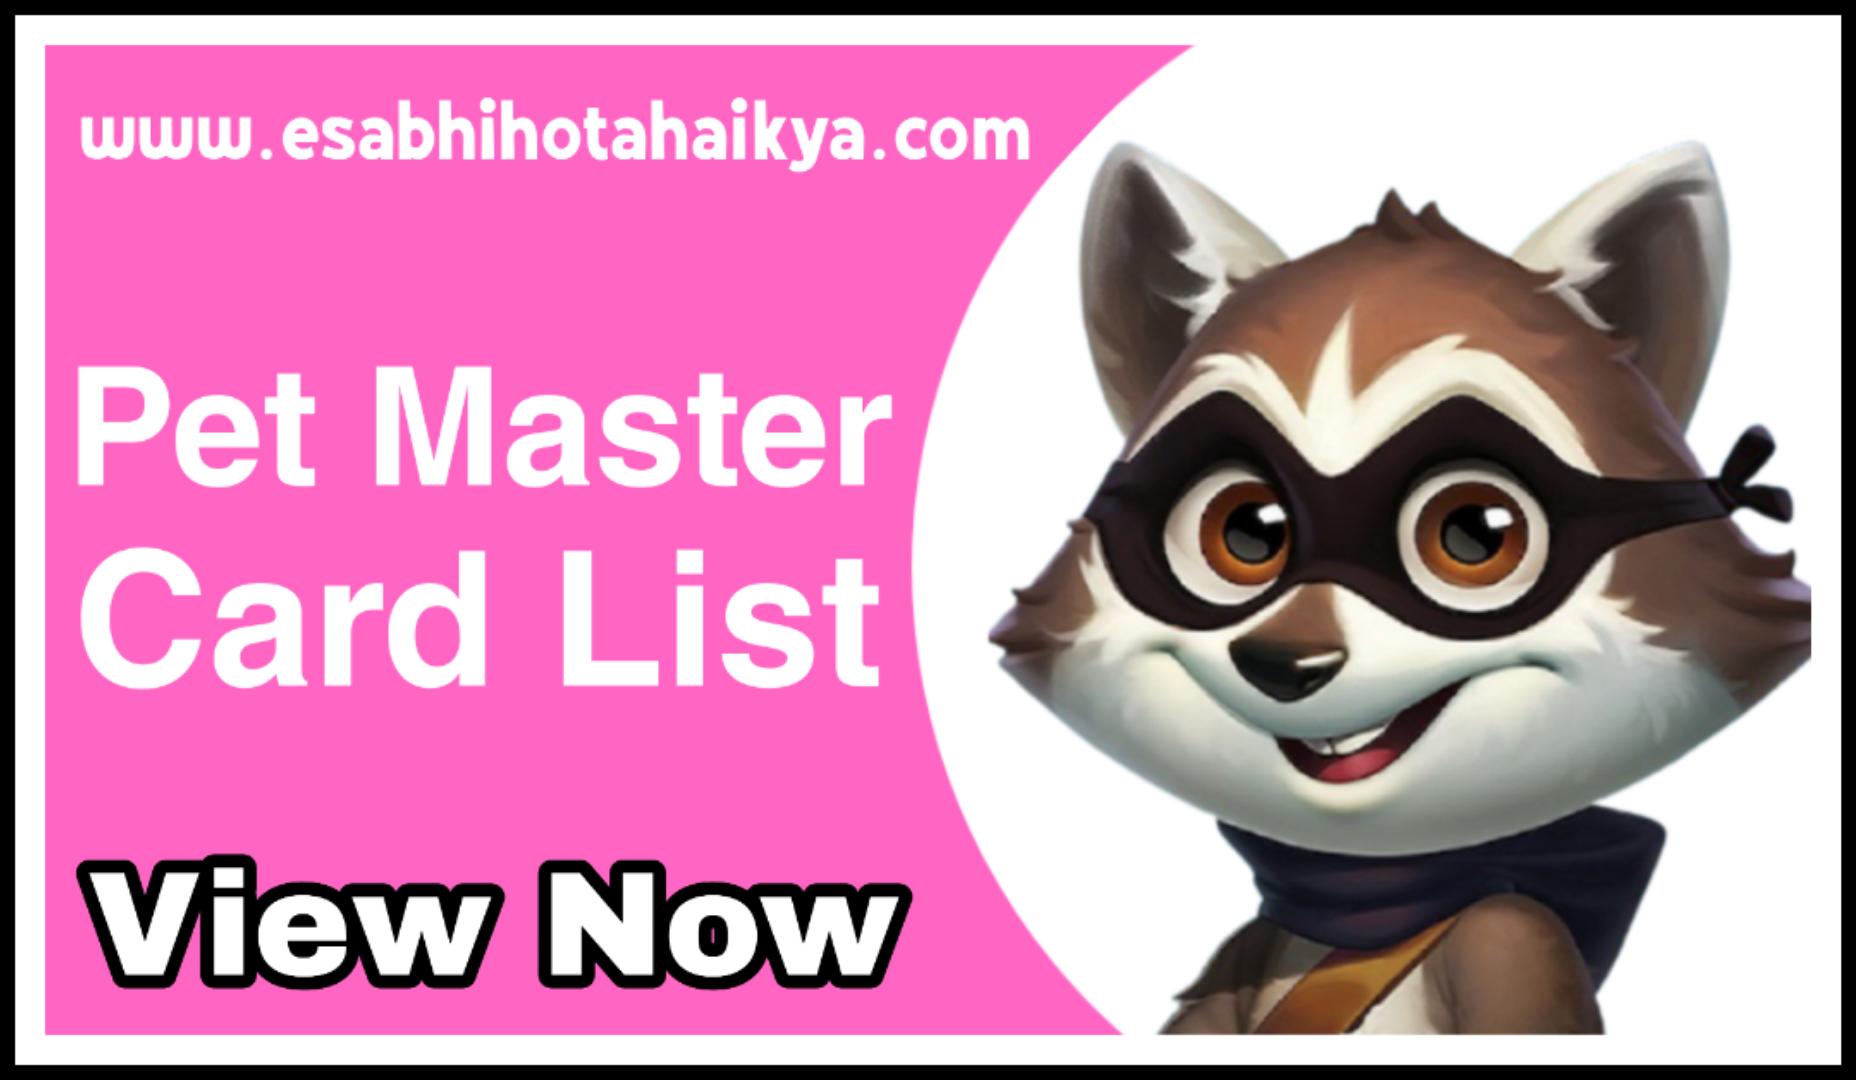 Pet Master Card List